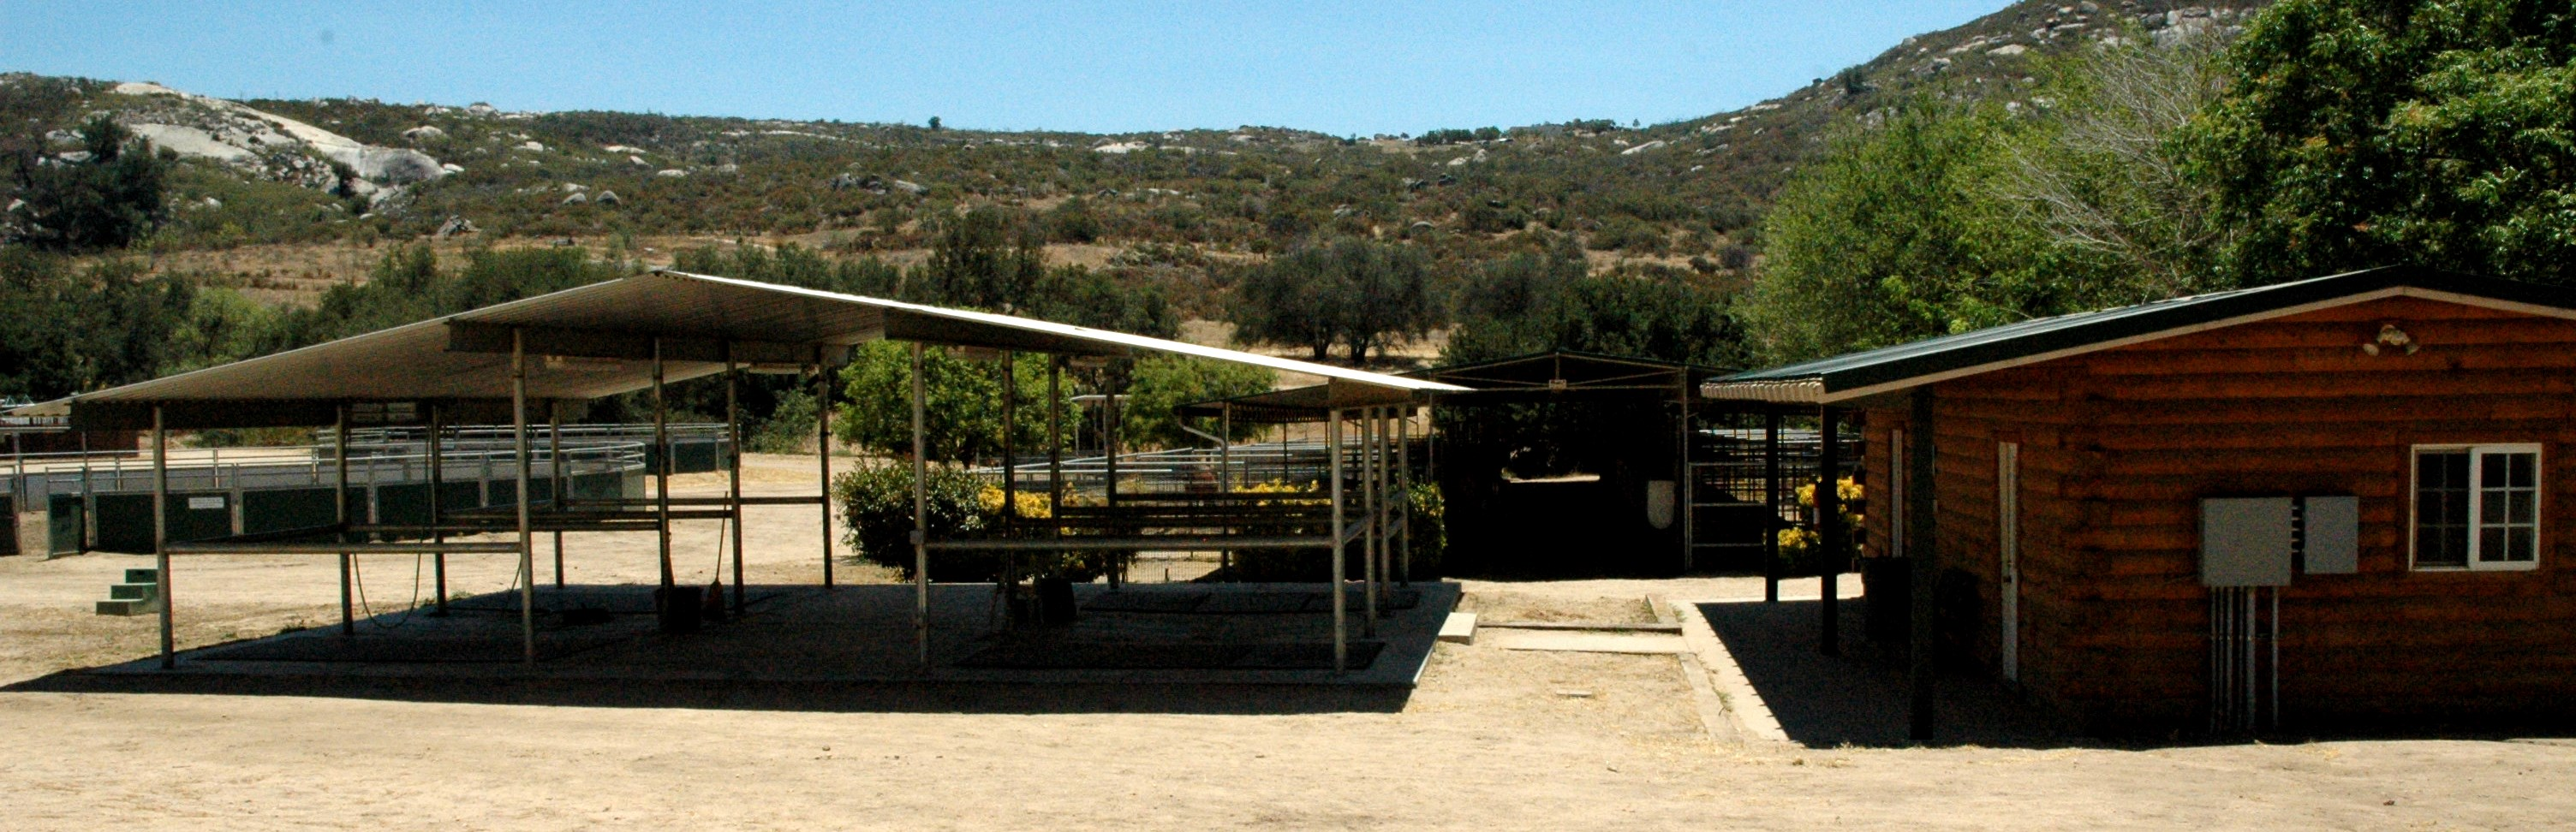 Cross Ties and California Stalls